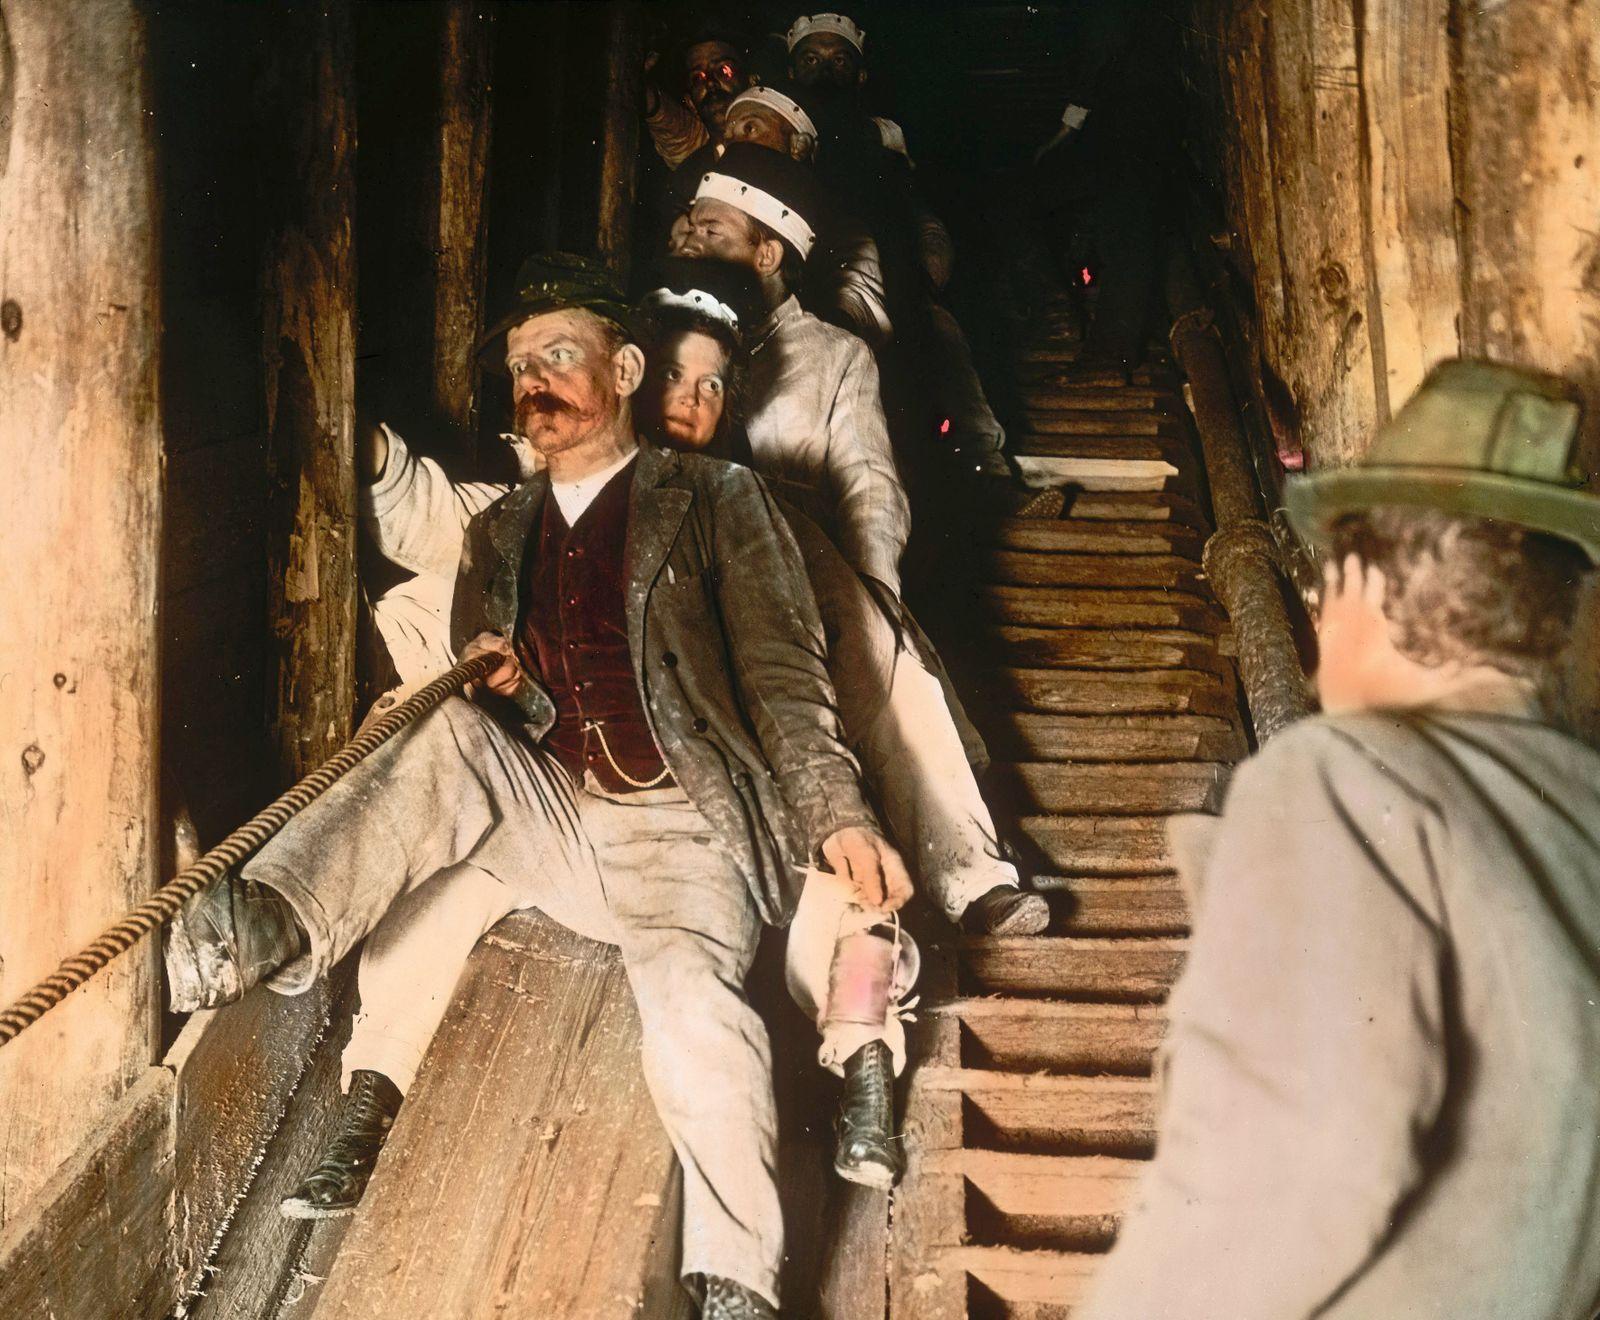 Tour guide and tourists in the salt mine of Hallstatt: departure on the chute. Salzkammergut. Upper Austria. Hand-colored lantern slide. Around 1910.